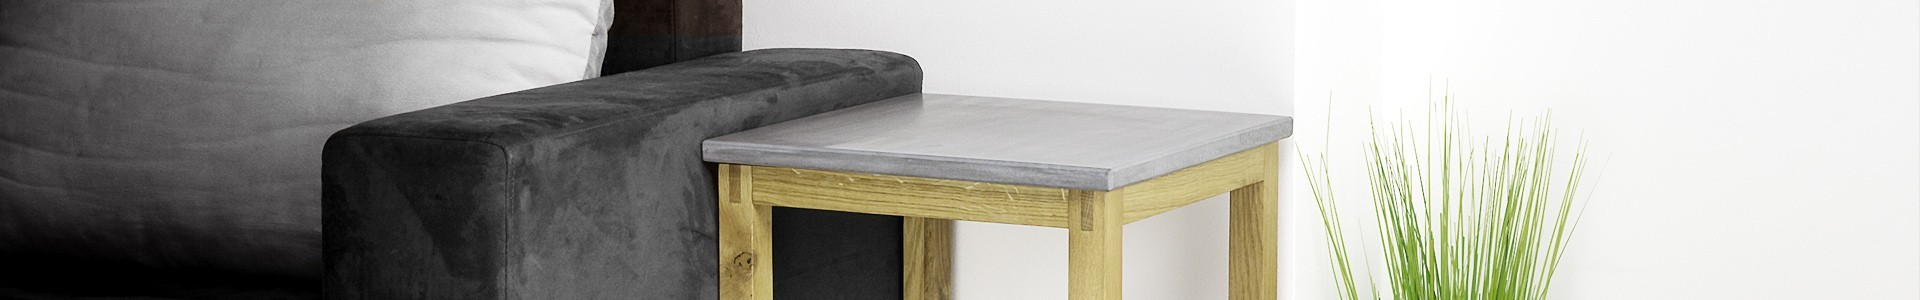 Betonmöbel concrete furniture concrete table beton tisch